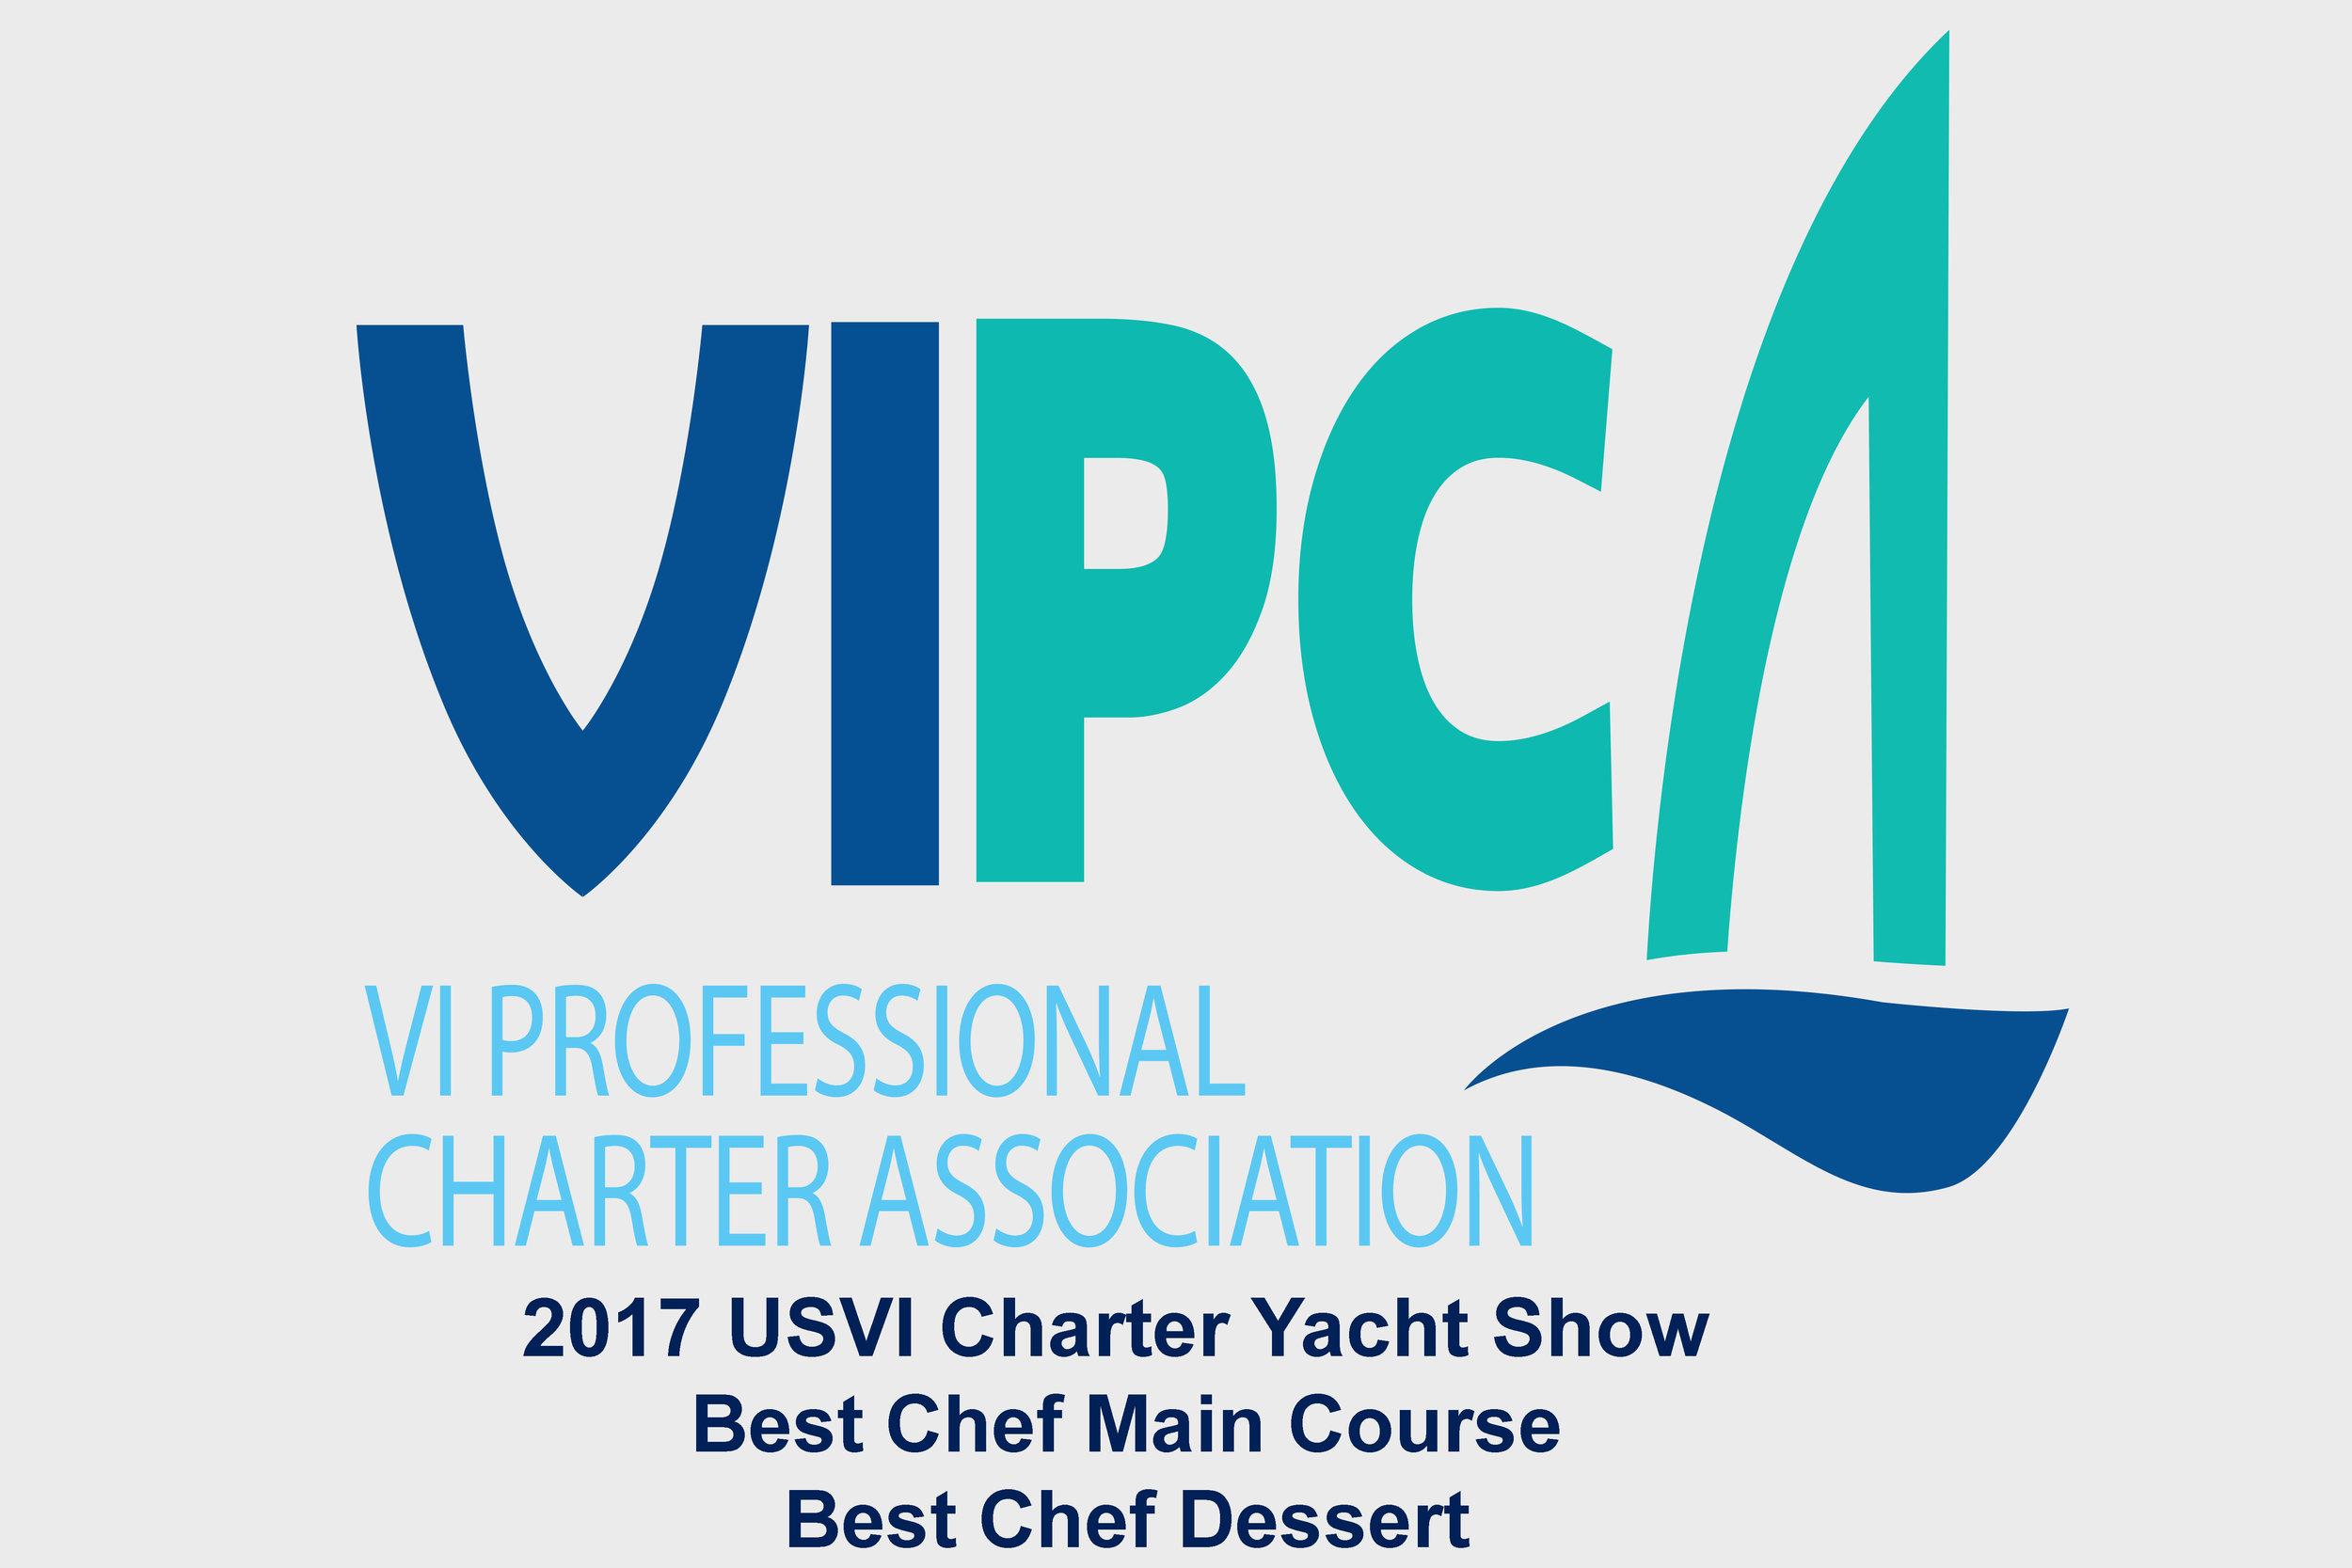 VIPCA Badge Chef.jpg